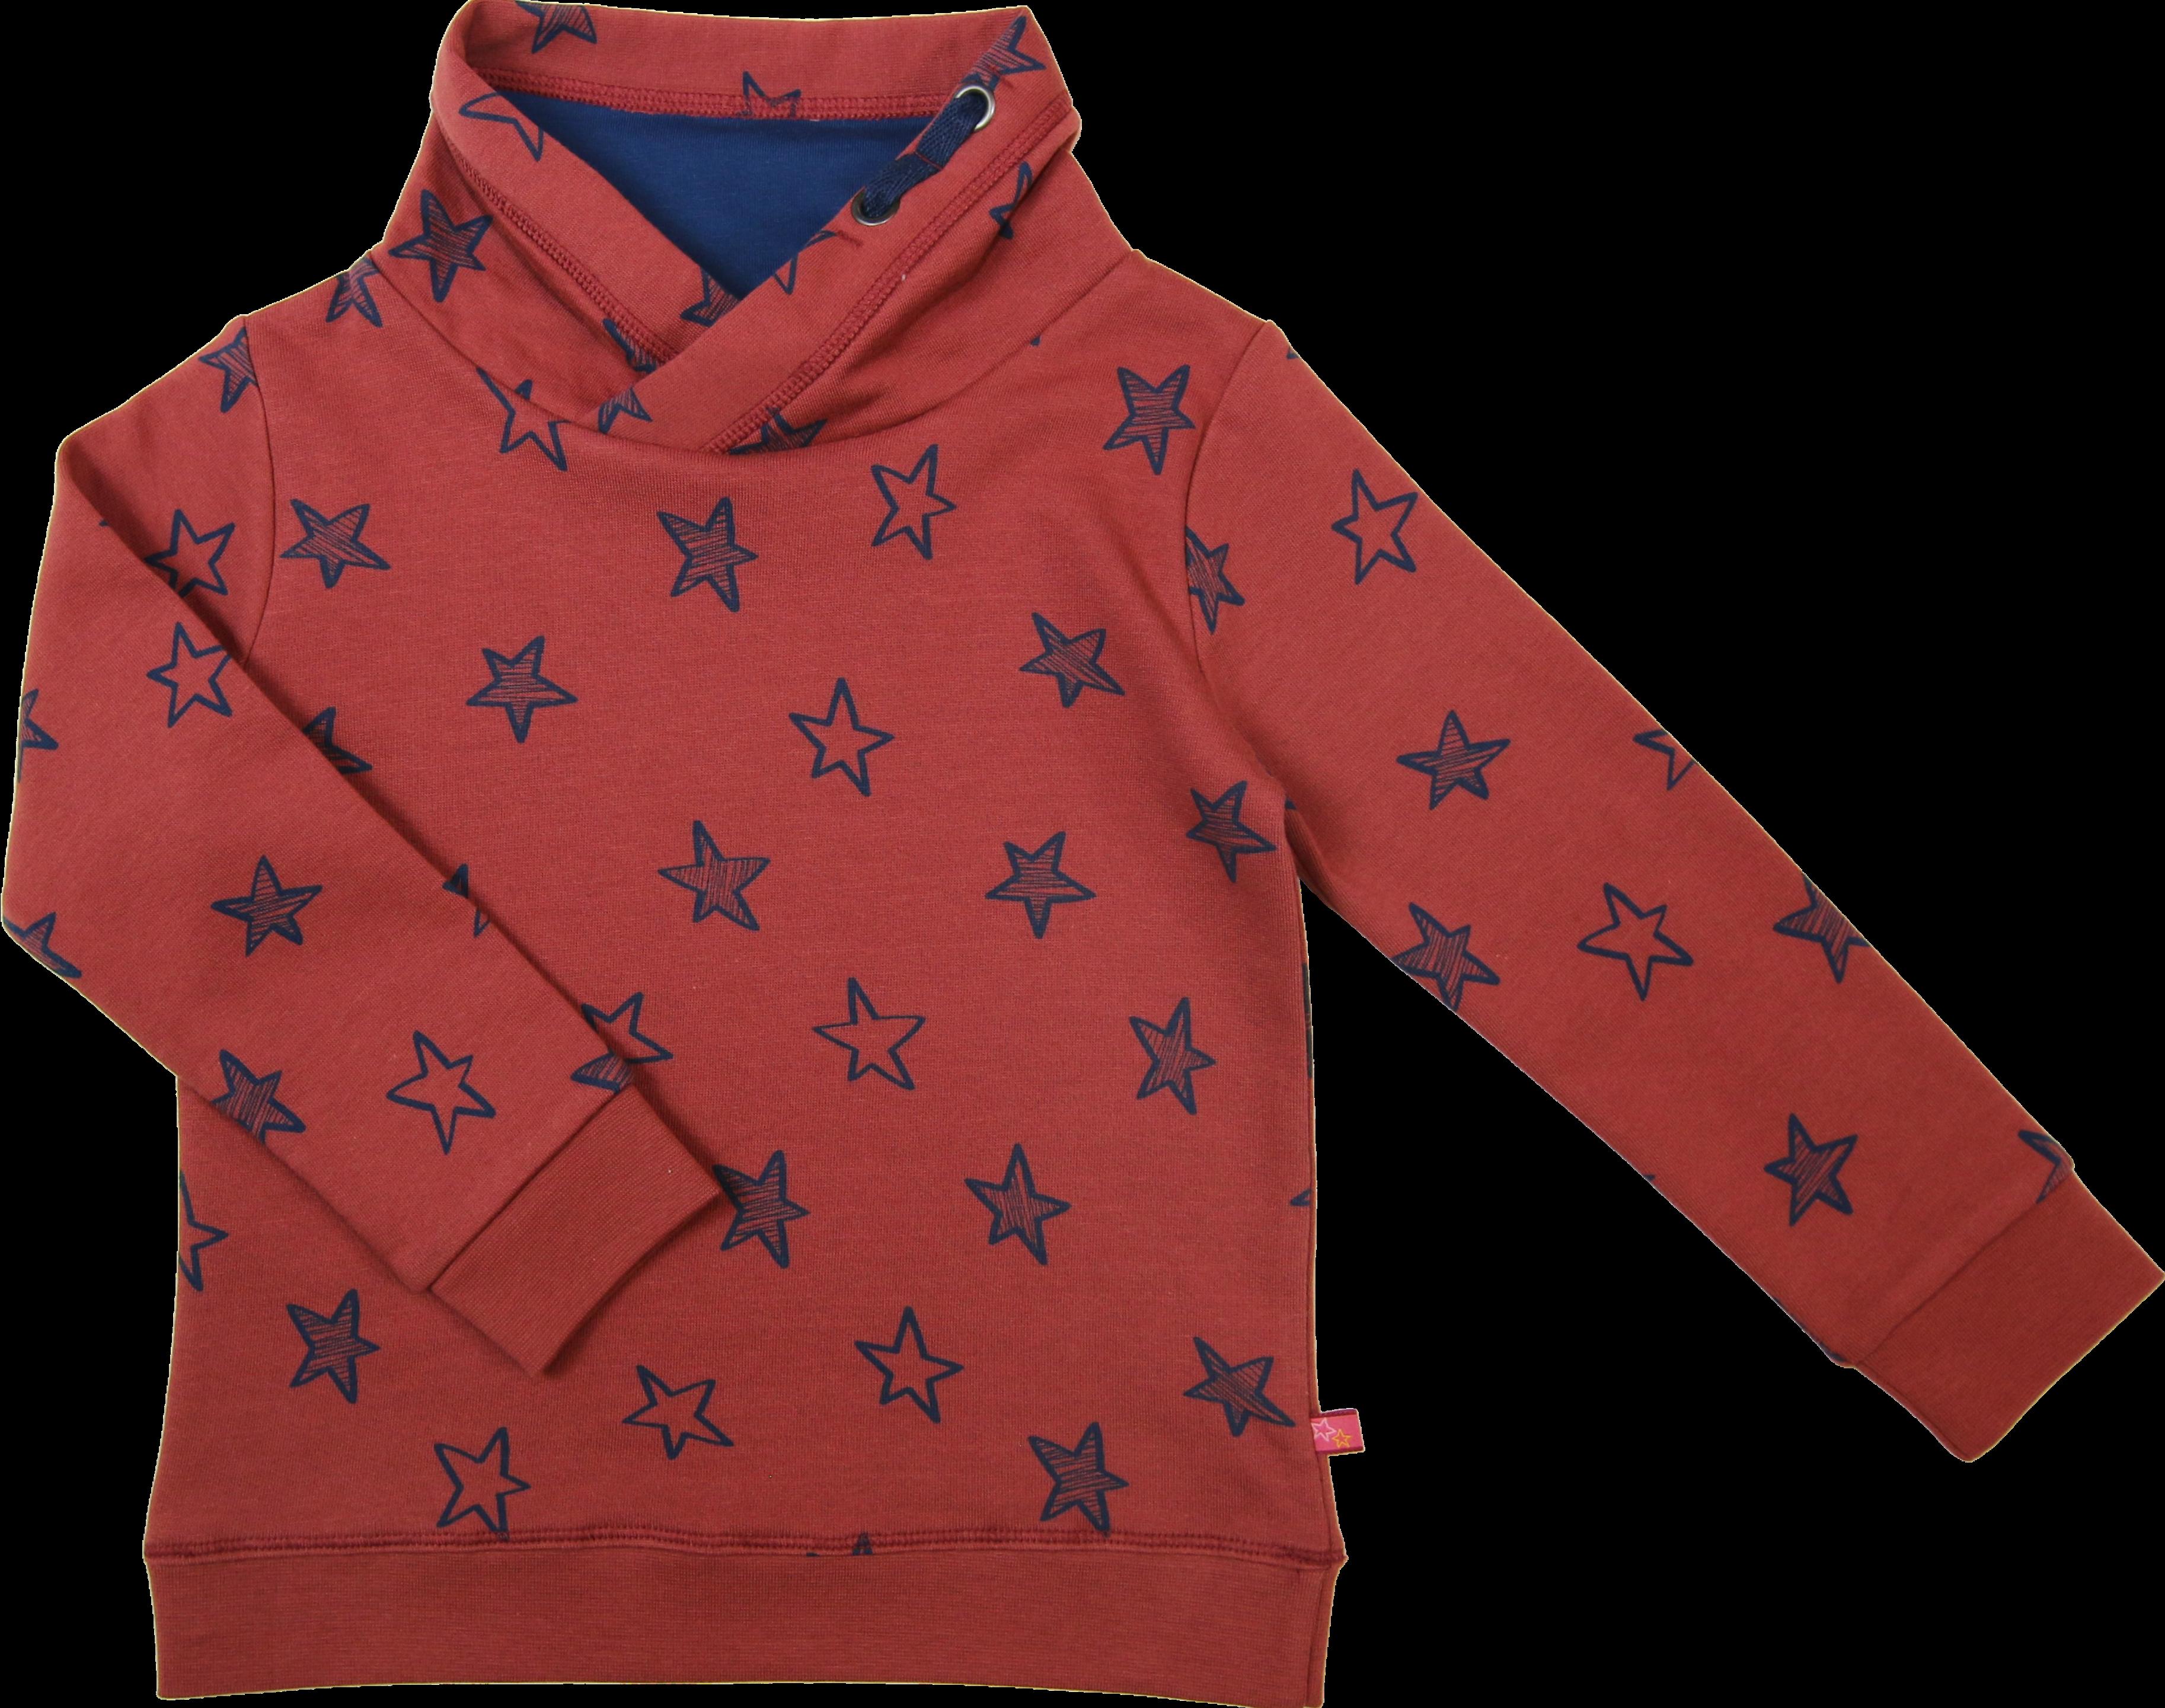 Kinder-Sweatshirt mit Sterndruck rost-tintenblau